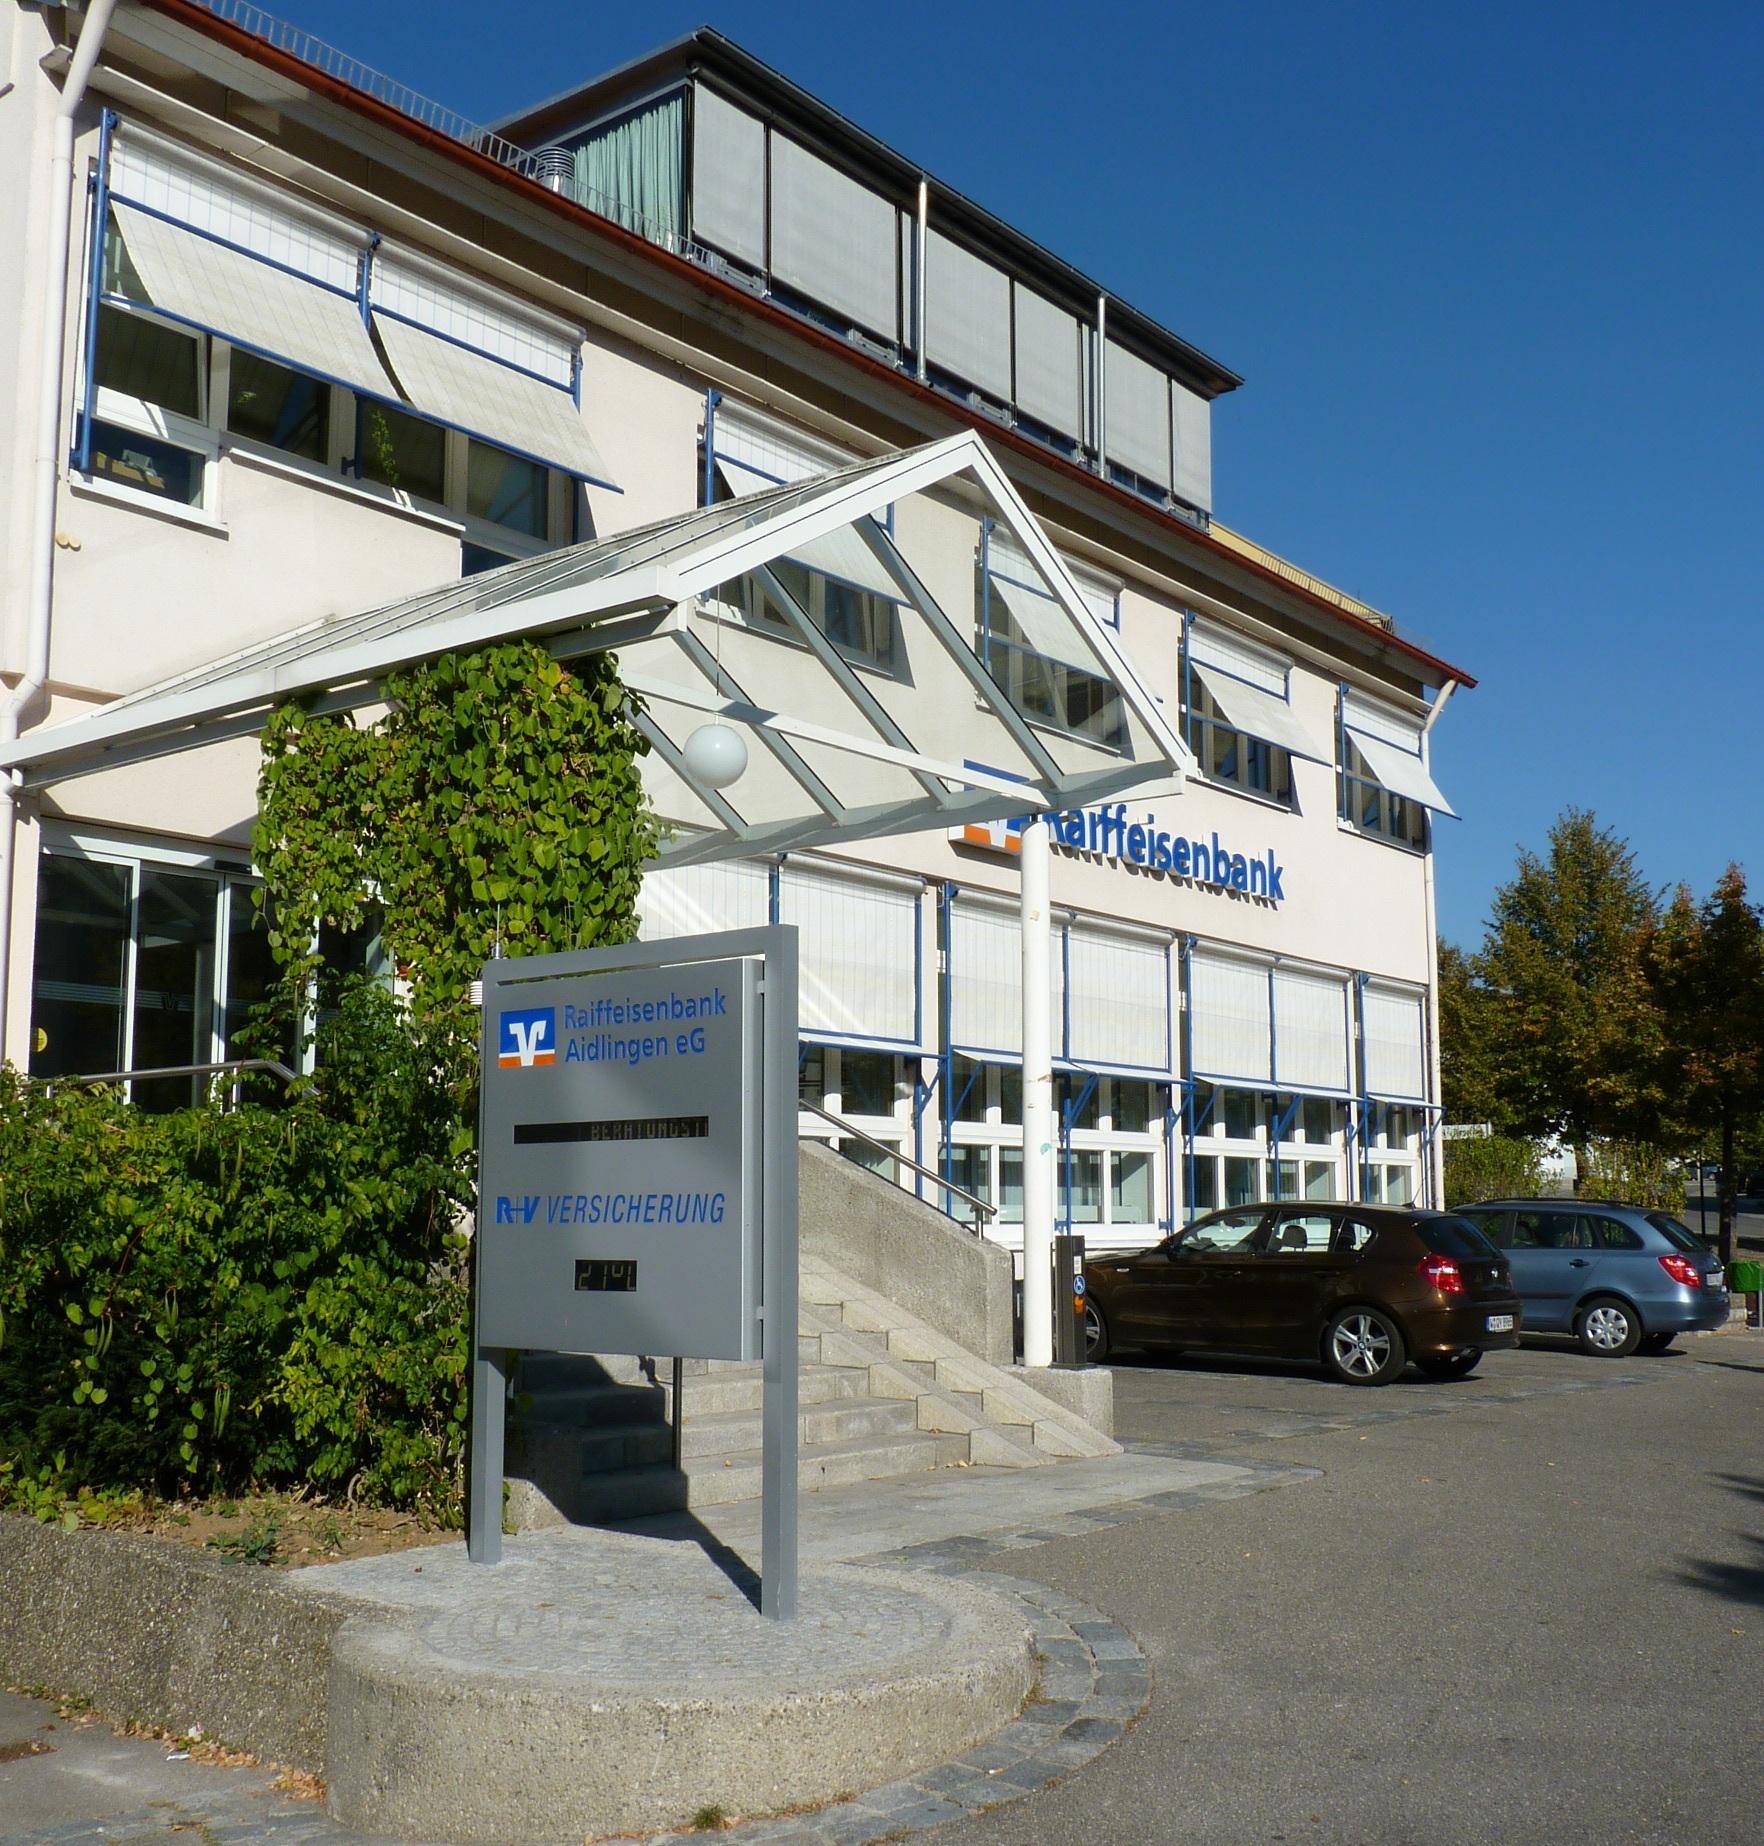 Raiffeisenbank Aidlingen eG, Raiffeisenbank Aidlingen eG, Hauptstrasse 8, 71134, Aidlingen